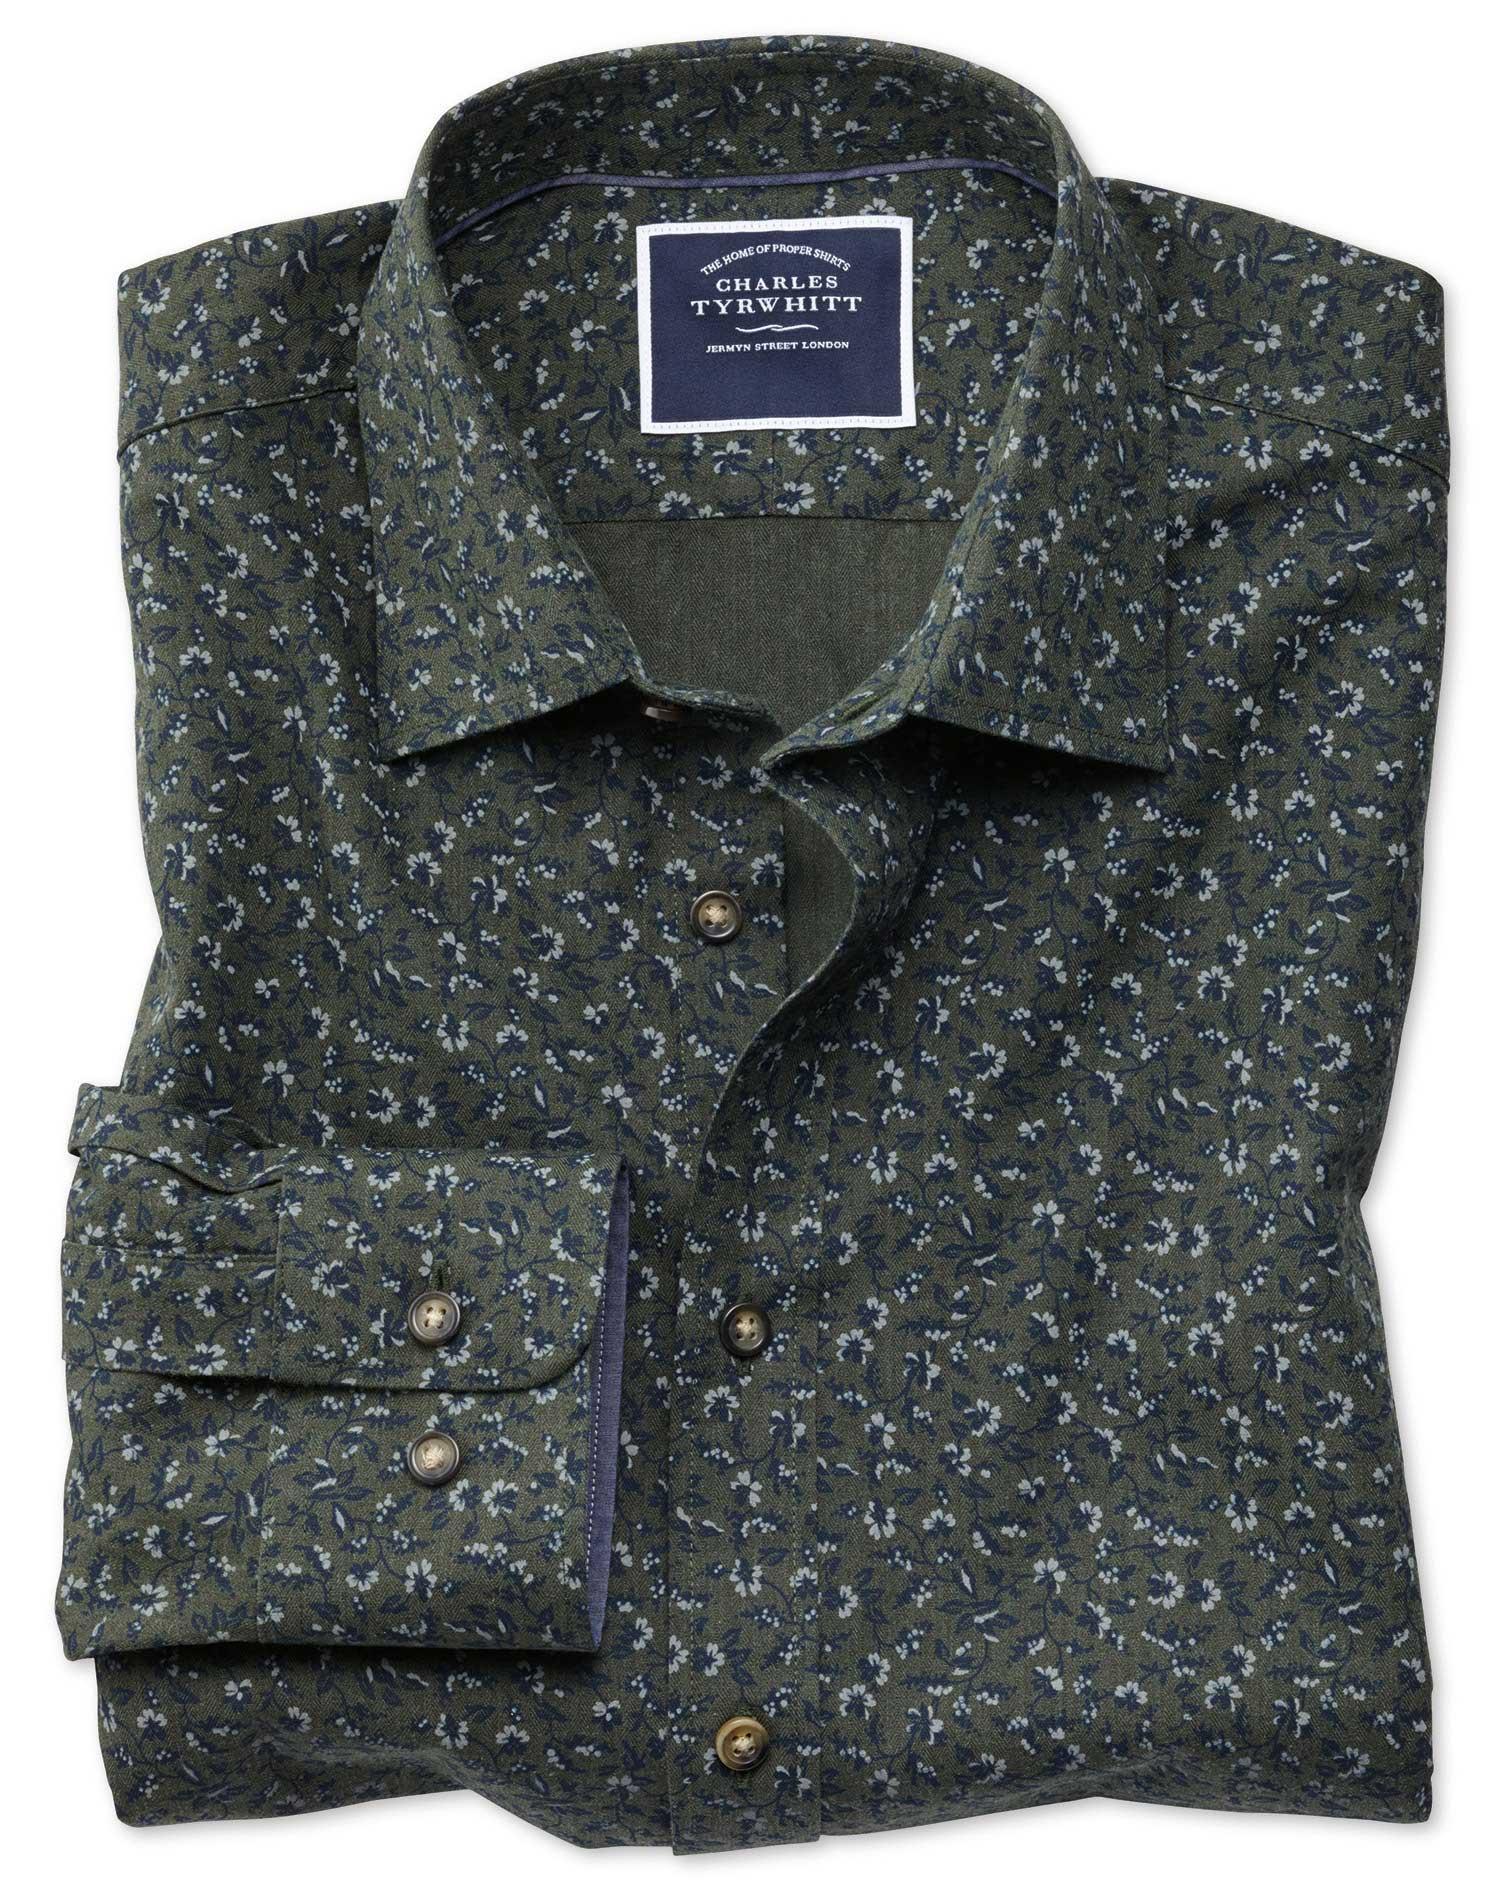 Slim Fit Green Floral Print Cotton Shirt Single Cuff Size XL by Charles Tyrwhitt